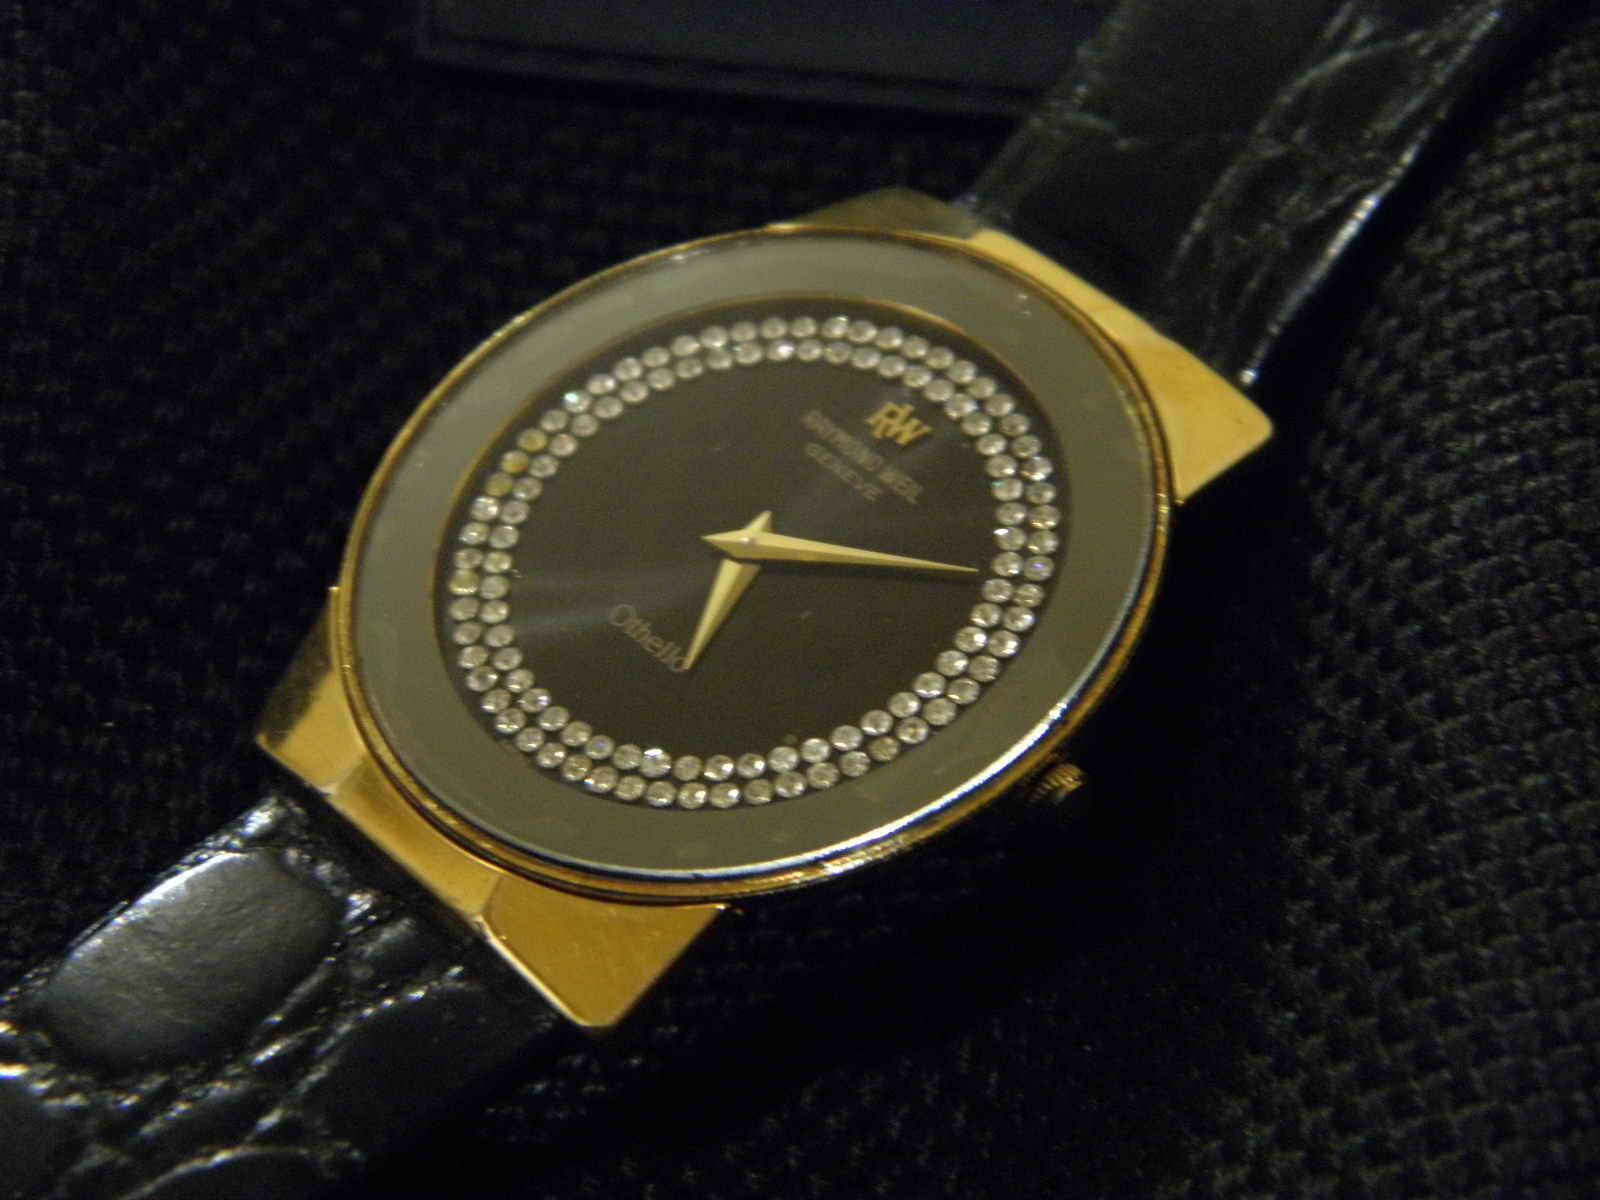 Dia 32 mm w c Dial masih bersih taburan diamond di sekeliling index tampak berkilau Hands cuma jam dan menit sederhana namun elegan